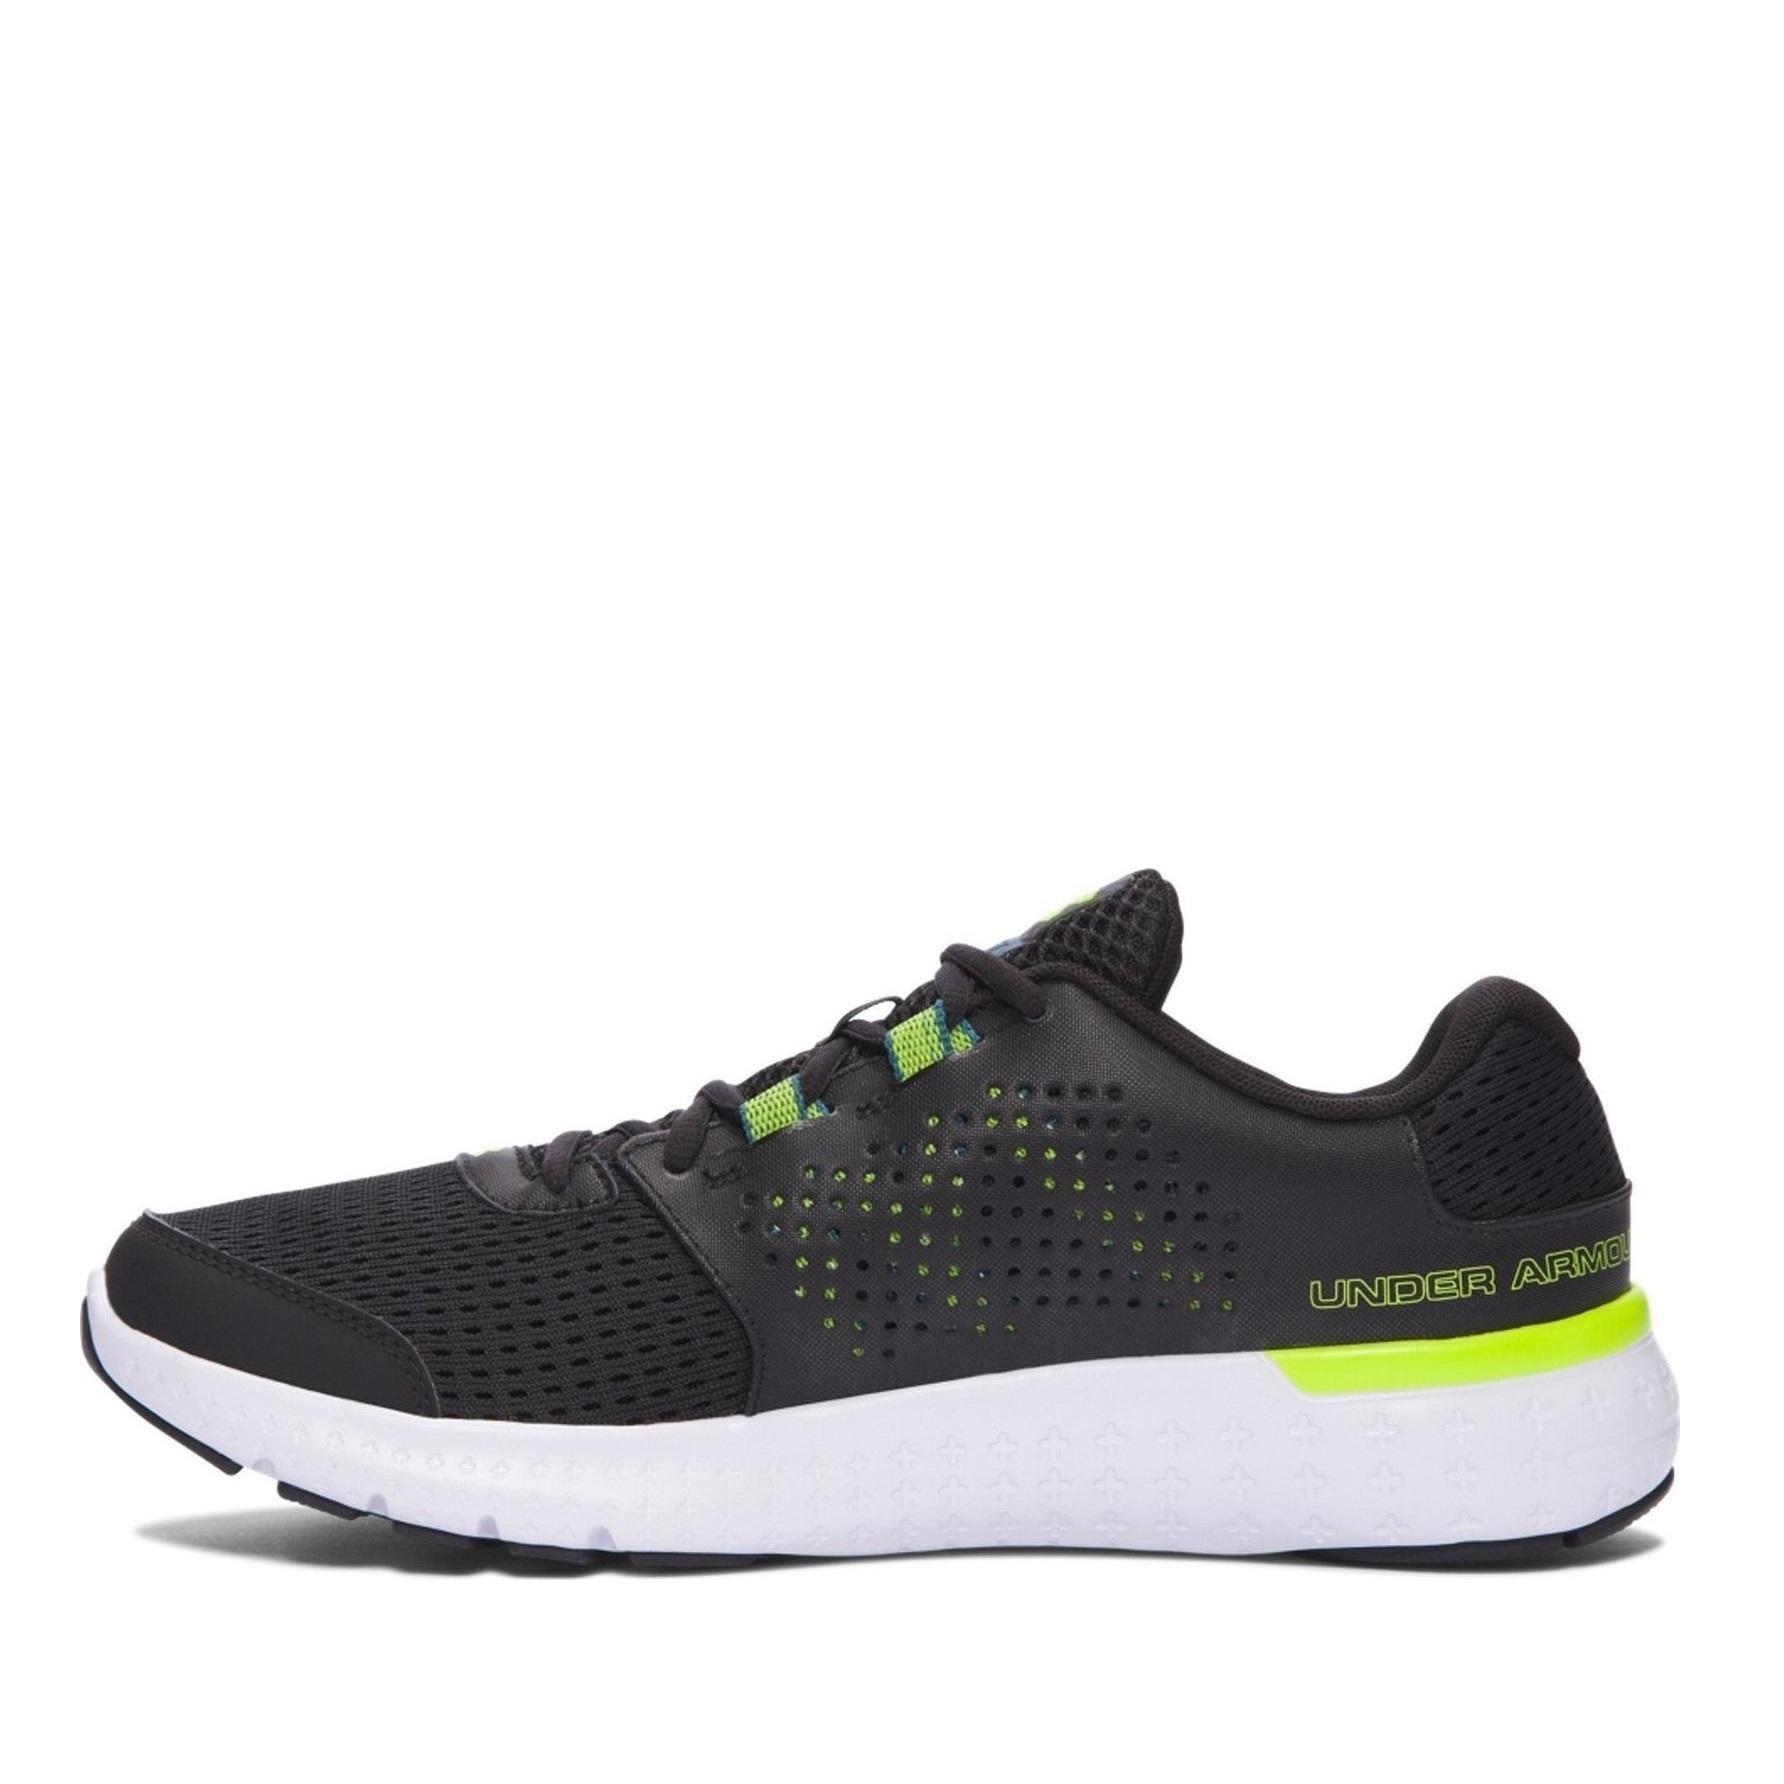 online retailer 6fe40 1b2a7 Shoes | Under armour UA Micro G Fuel 5670 | Fitness